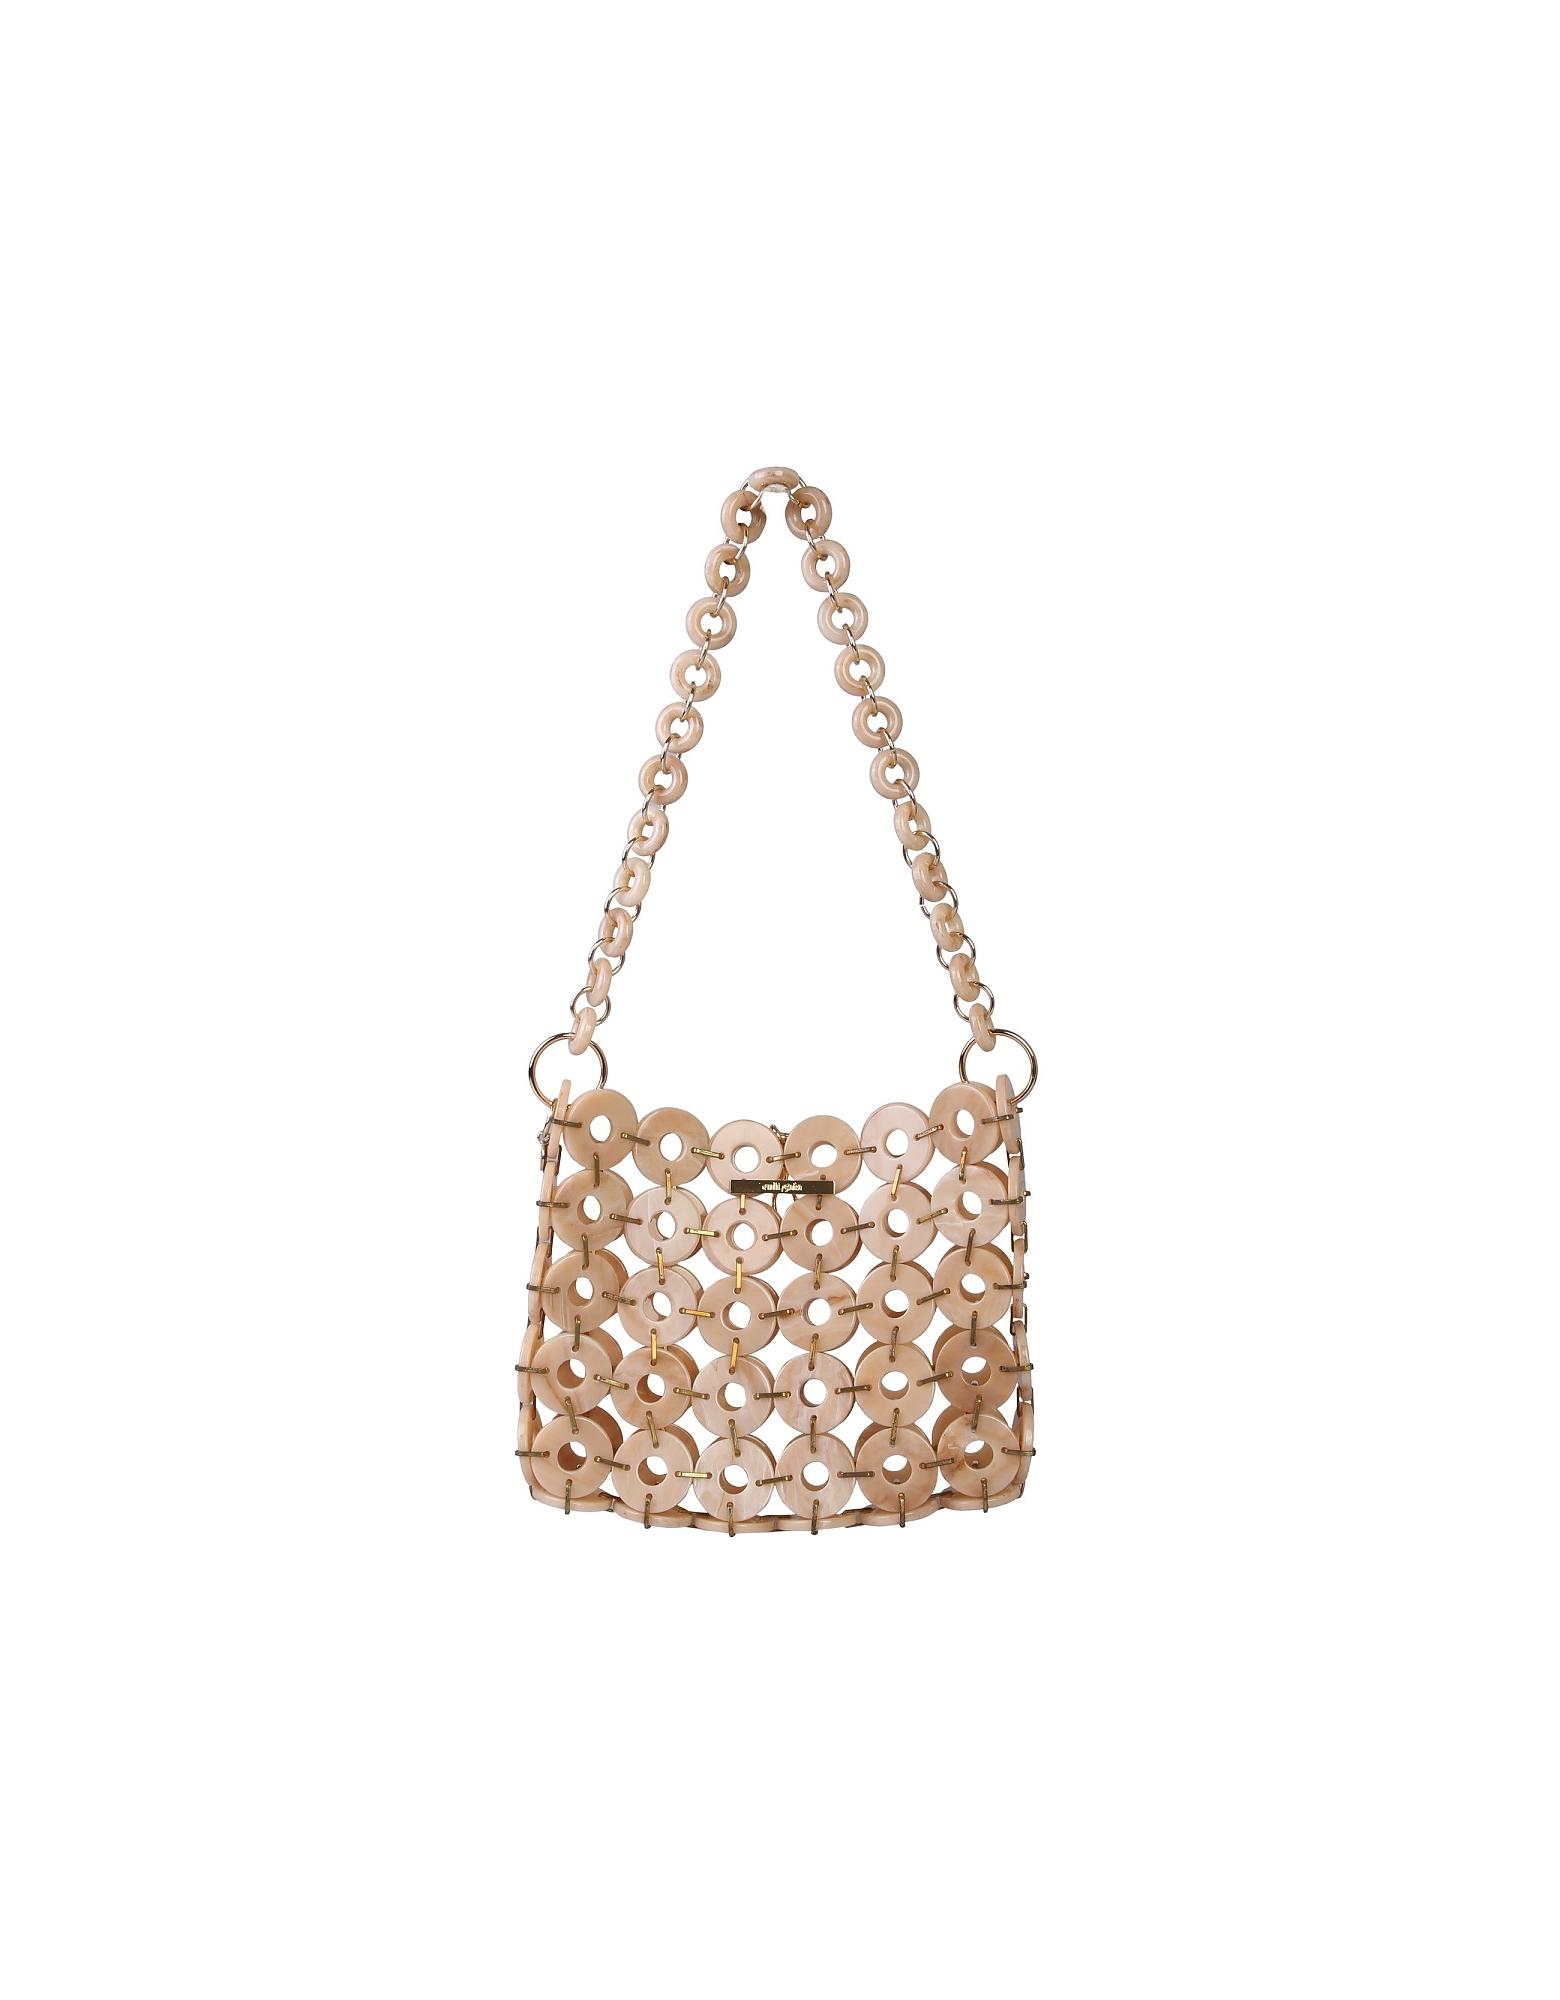 Cult Gaia Designer Handbags, Jasmine Shoulder Bag